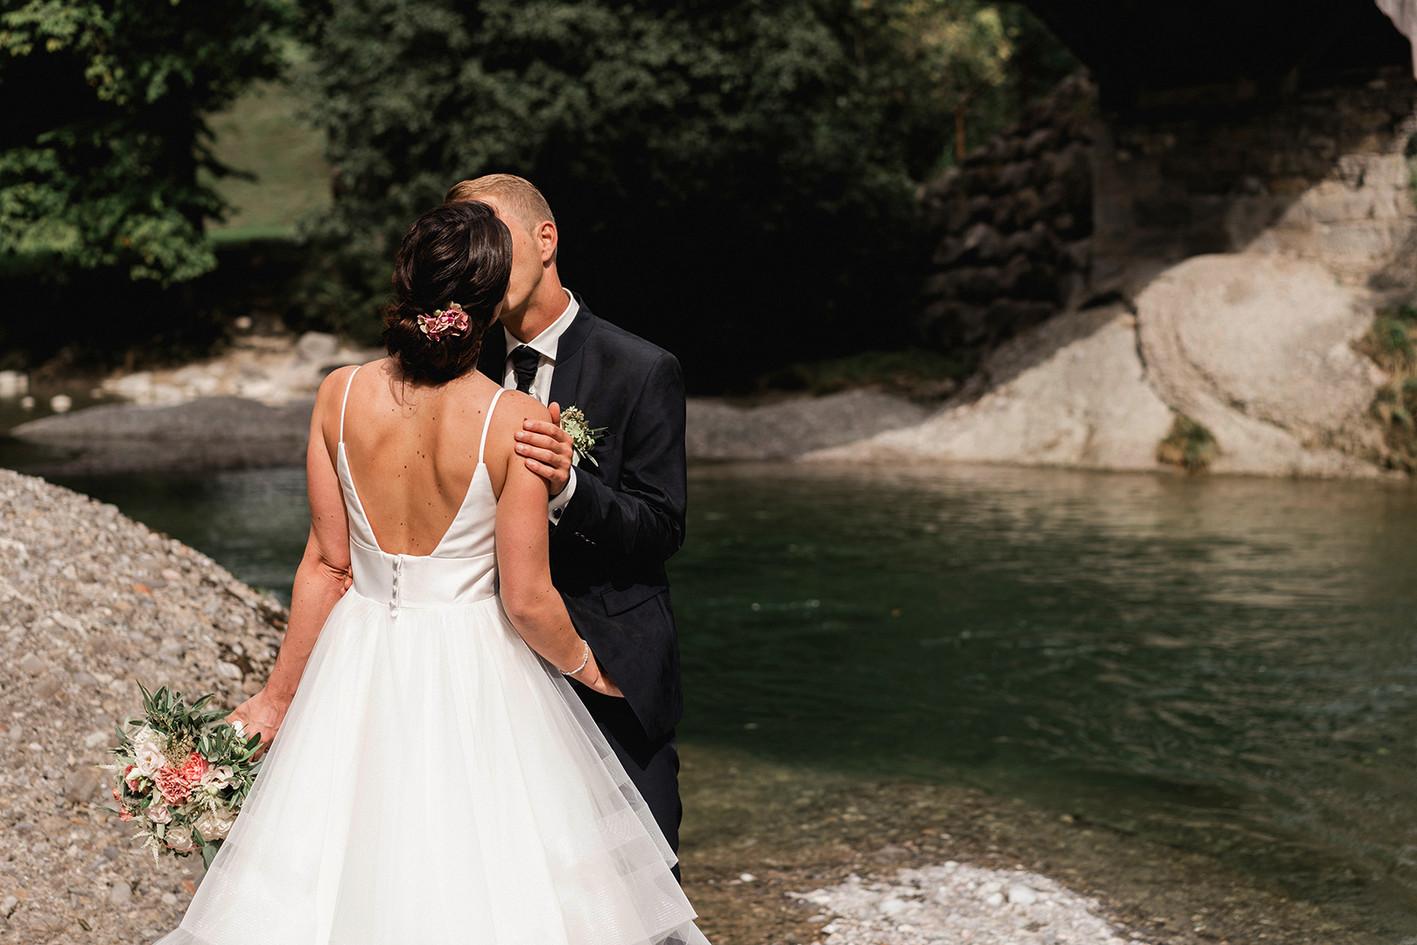 076-married-united-wedding-suephotoart-p